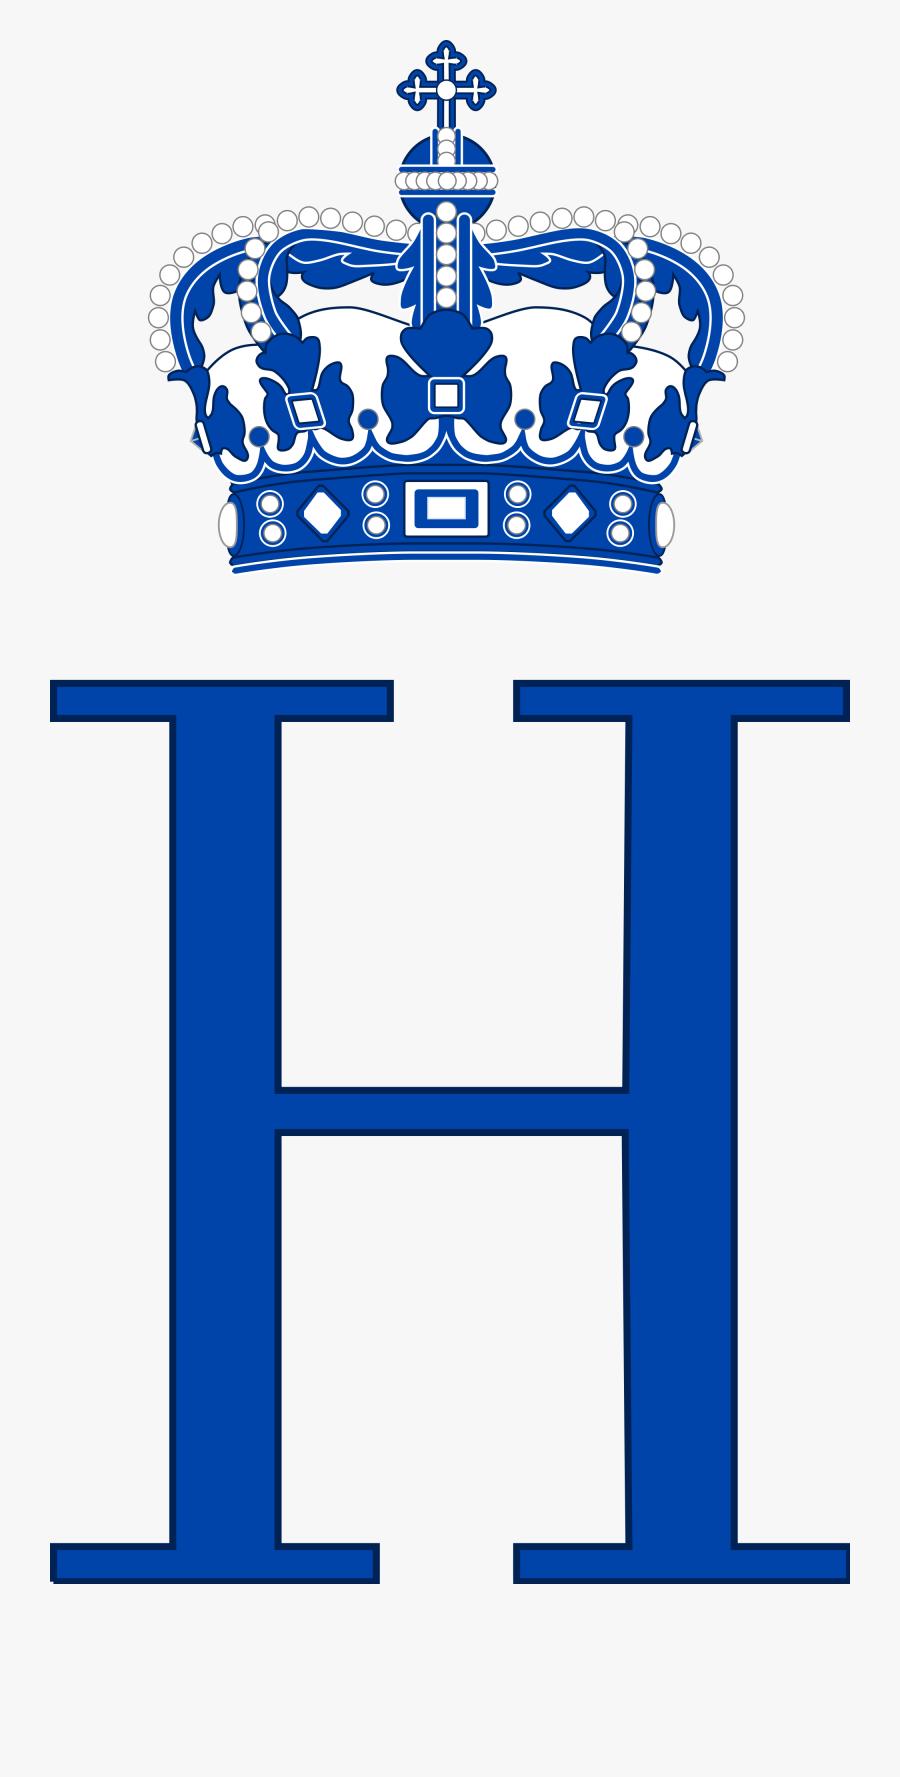 Royal Monograms - Royal Monogram, Transparent Clipart